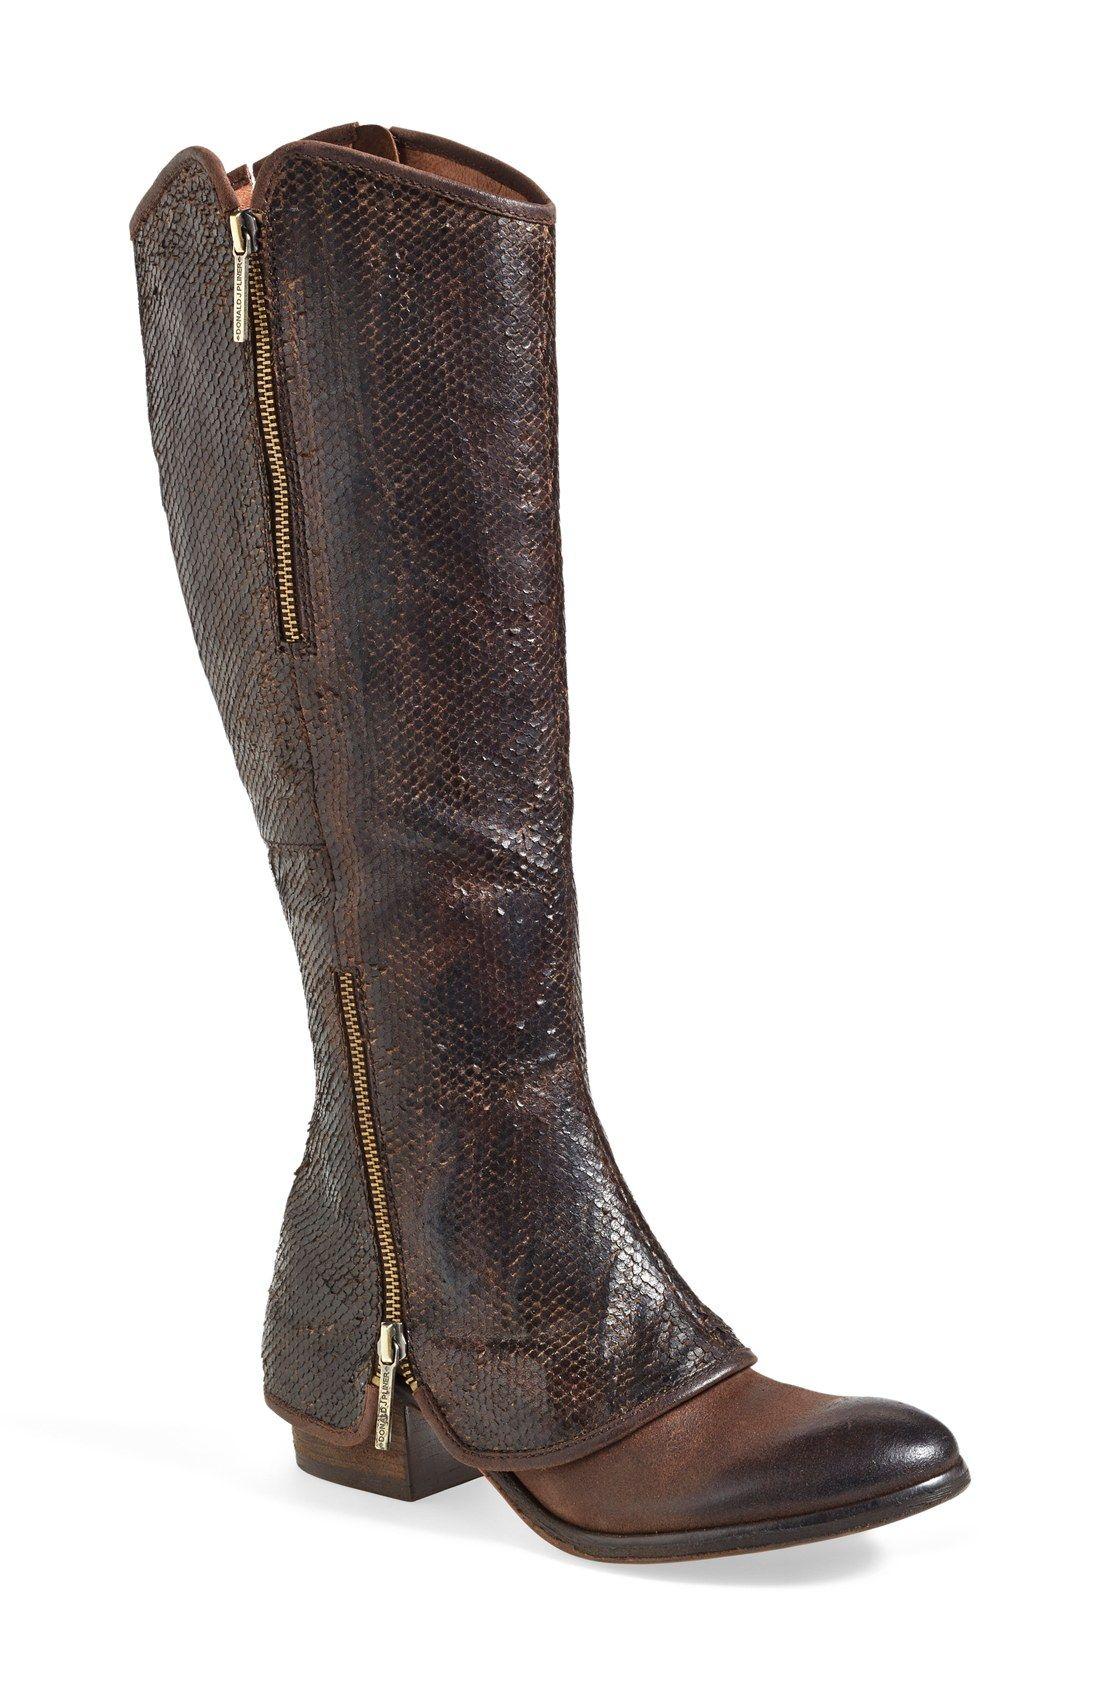 Donald J Pliner Donald J Pliner 'Devi' Boot (Women) available at